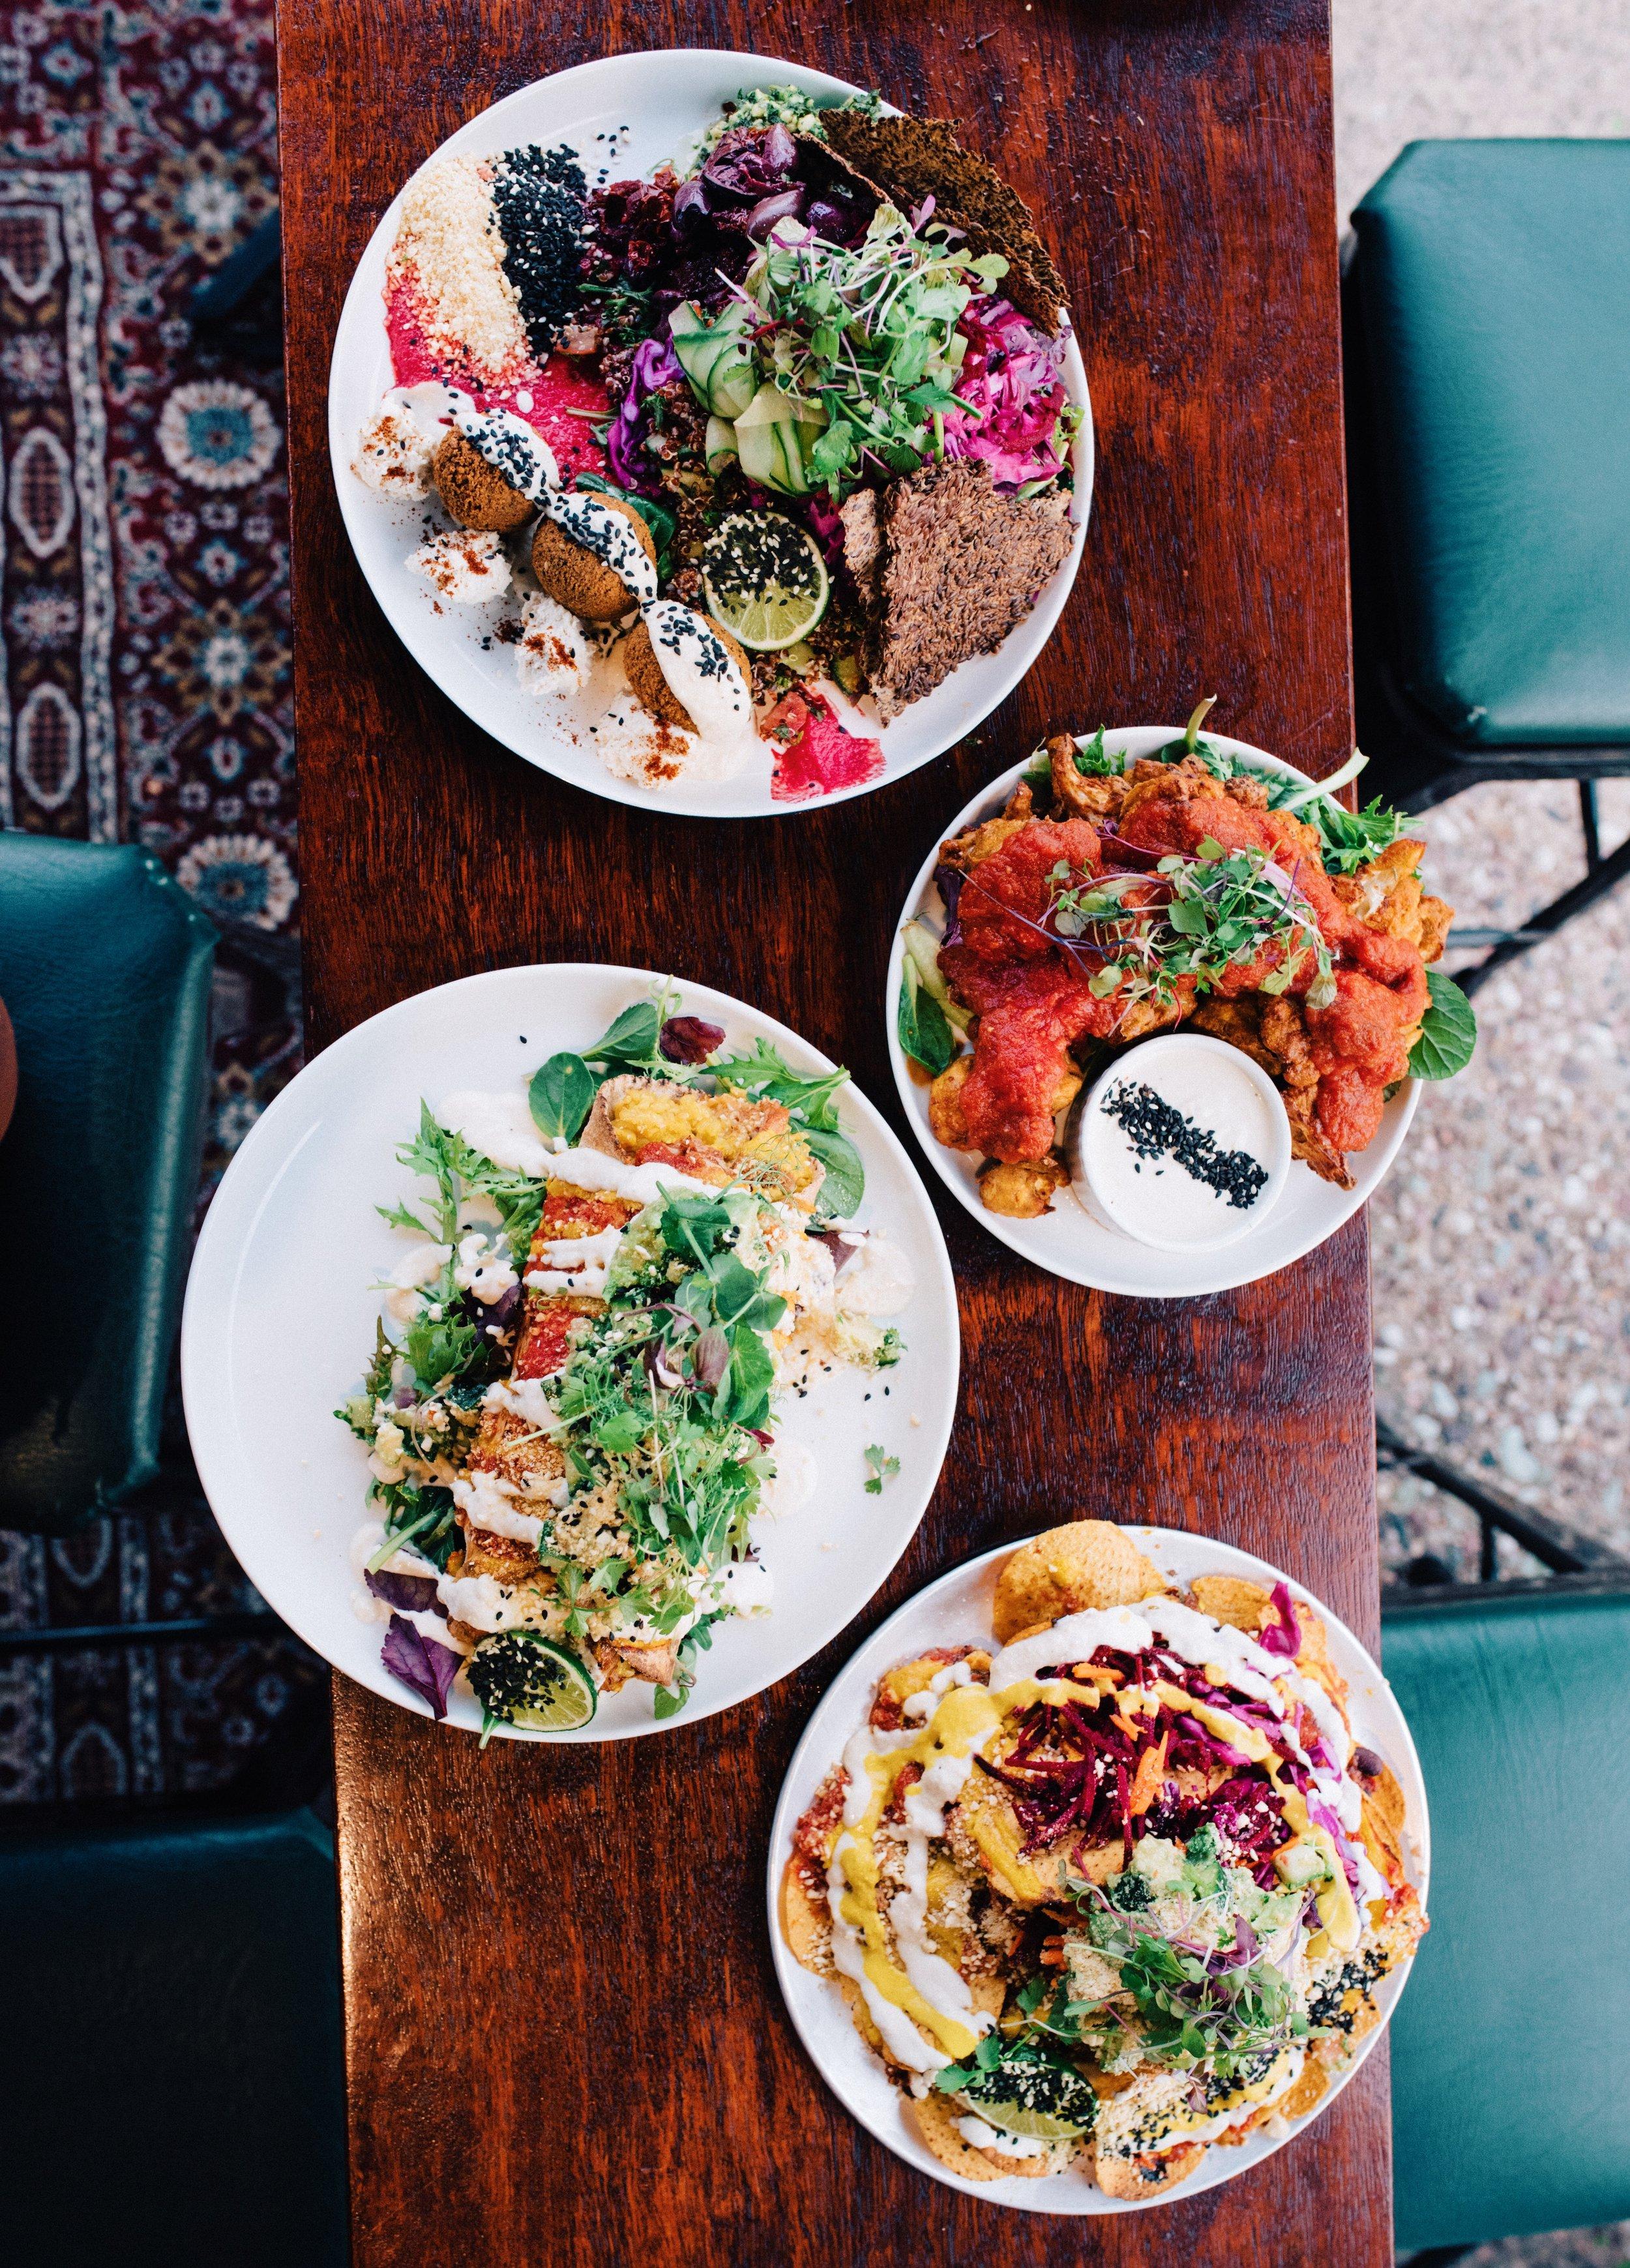 Top to bottom: planet plate, cauliflower wings, enchilada, nachos